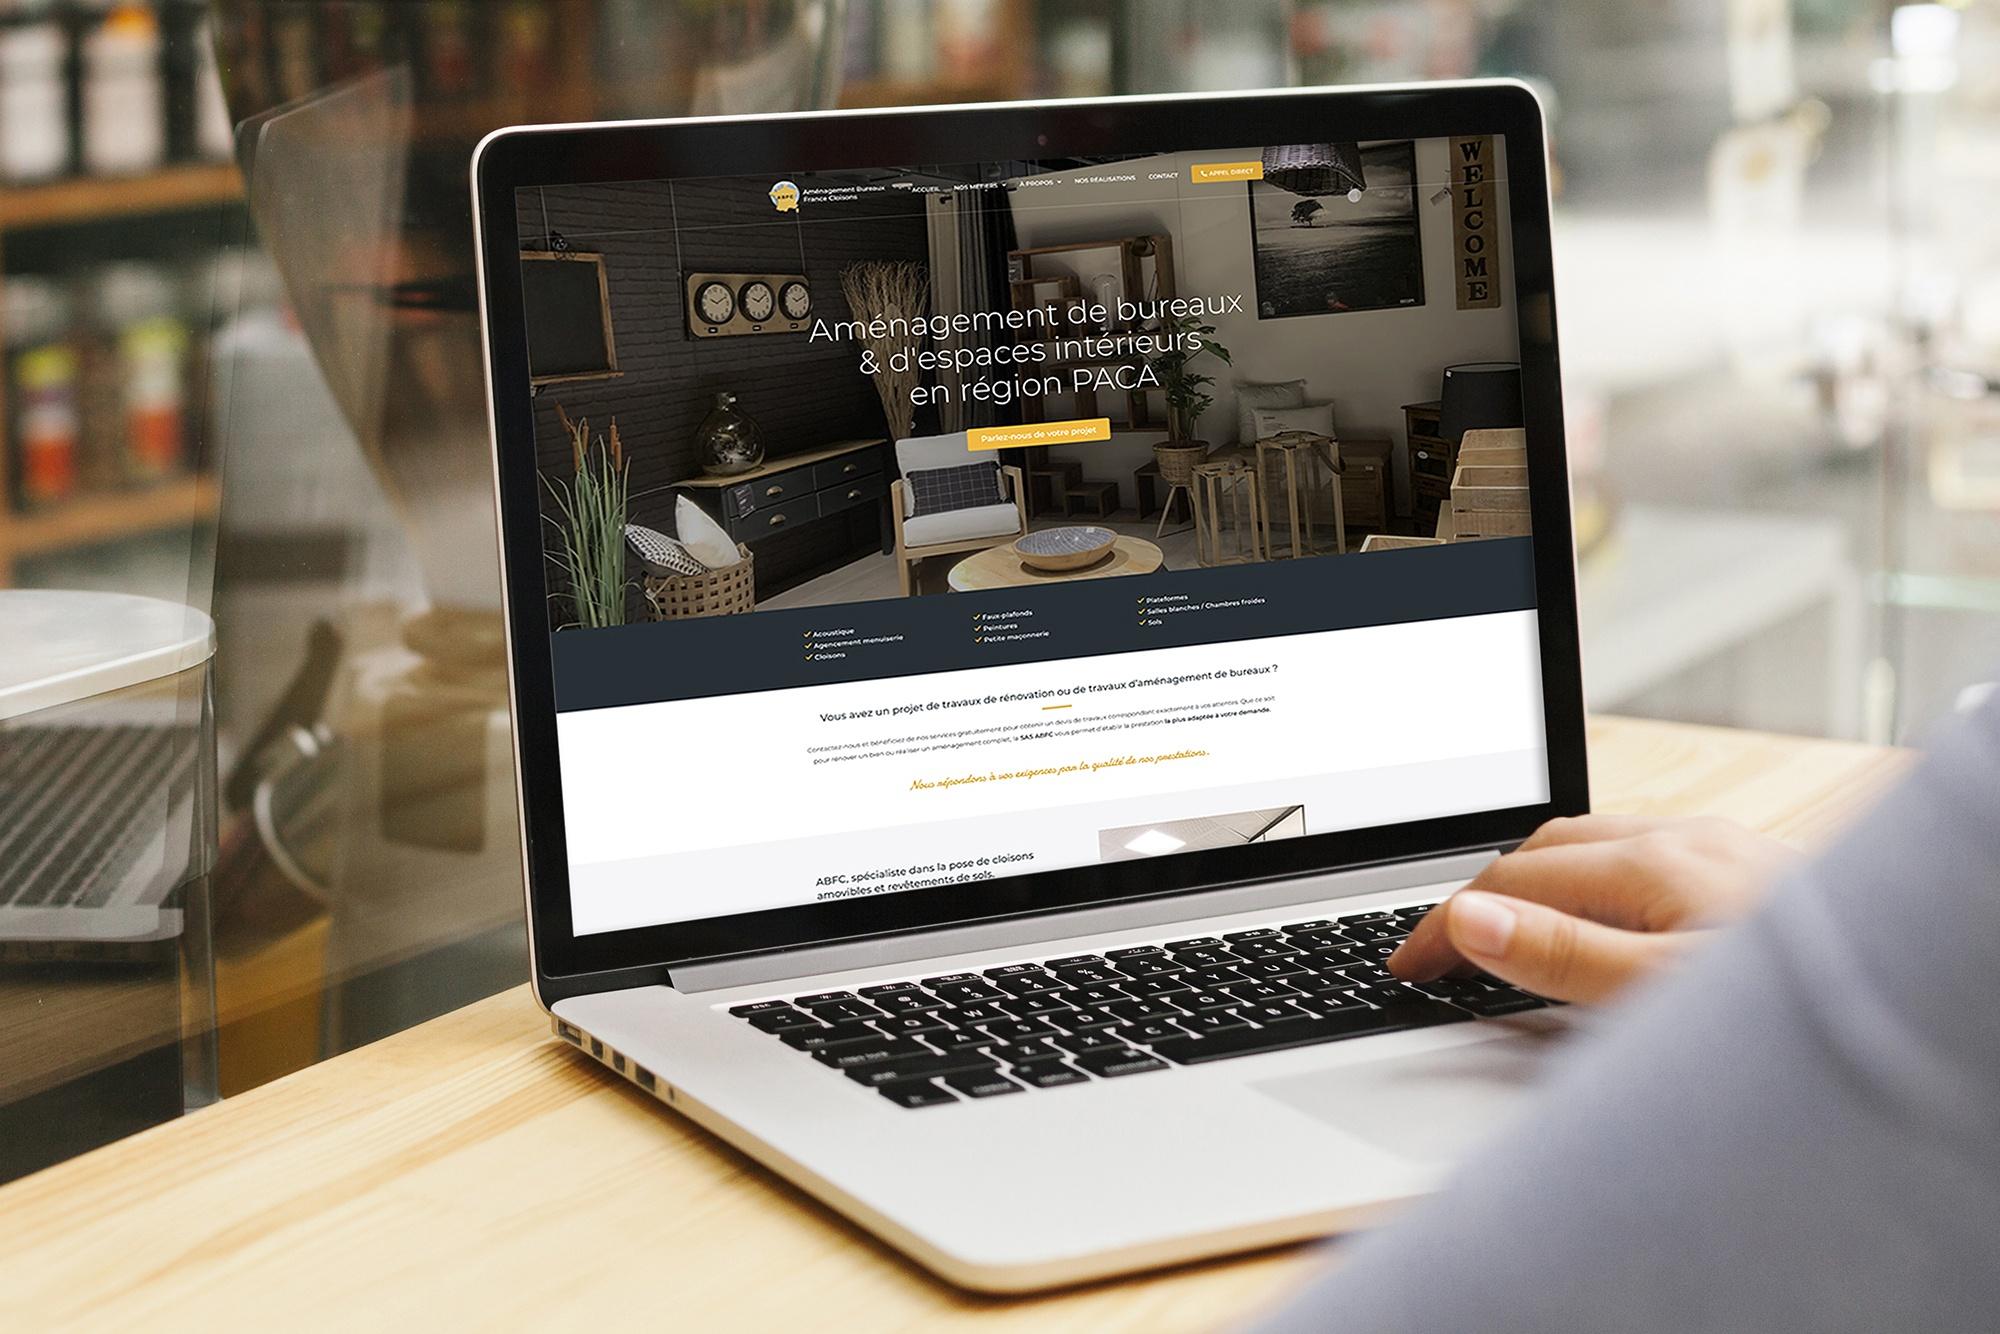 création site internet site web à Annecy en Haute-Savoie (74) webdesigner freelance freed from design